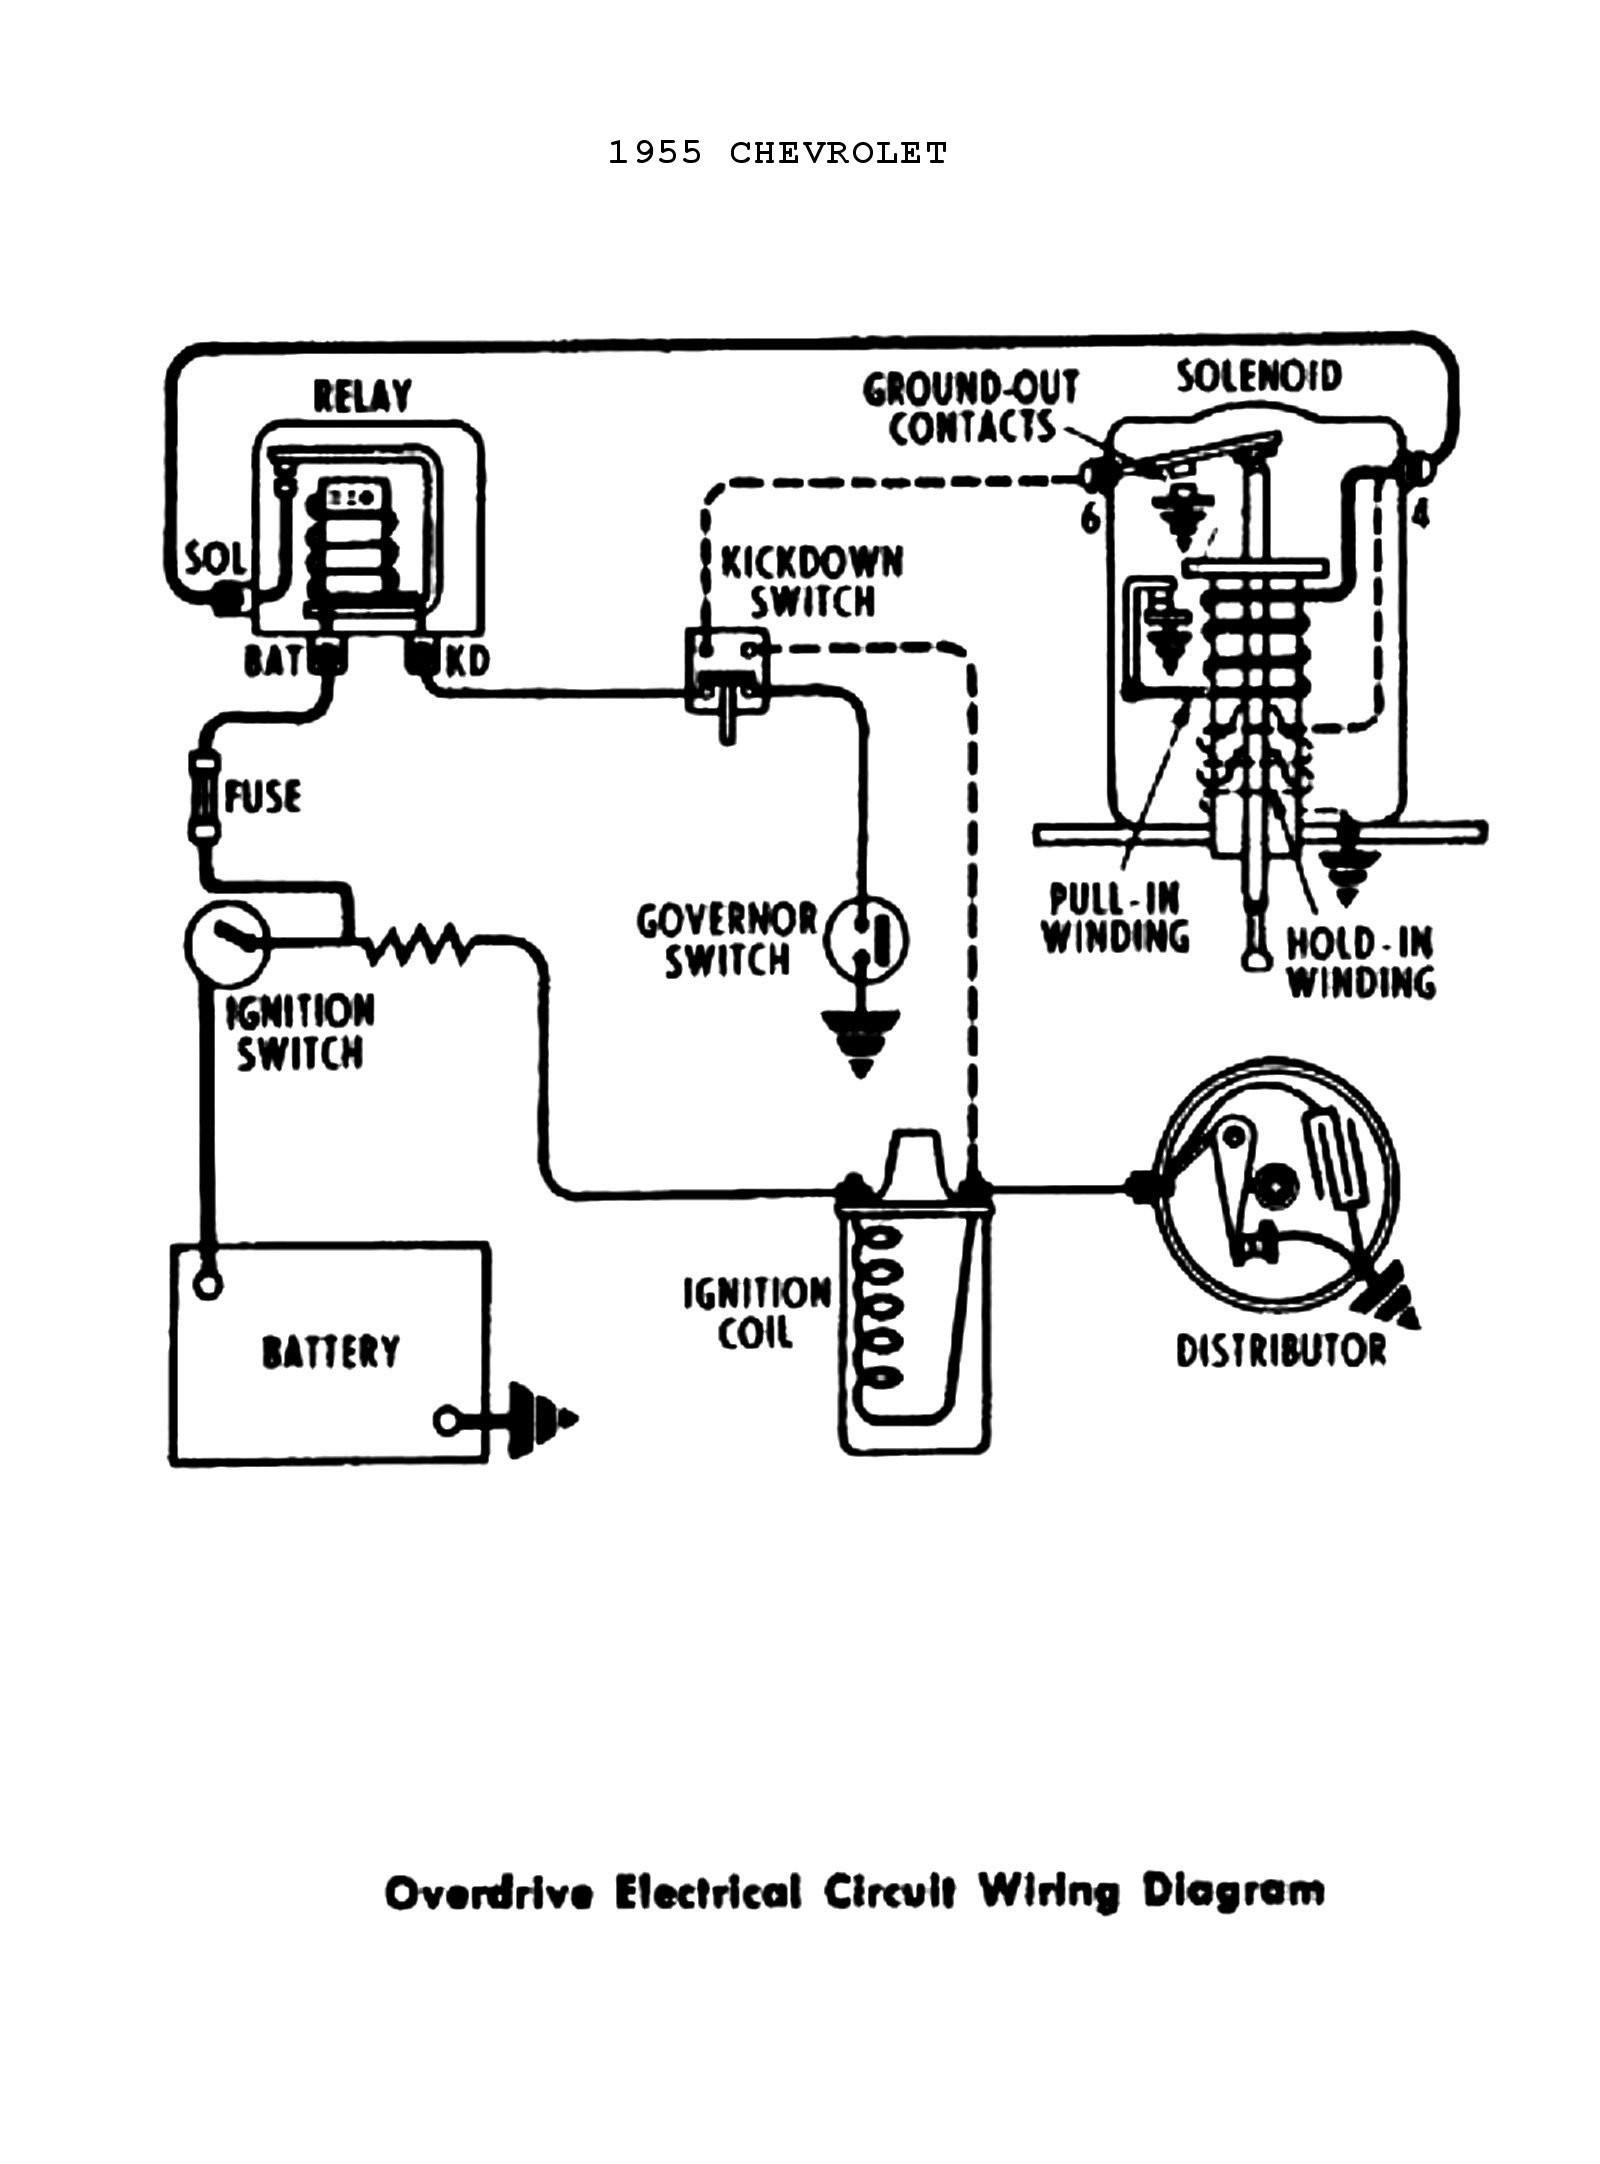 57 Chevy Heater Wiring Diagram